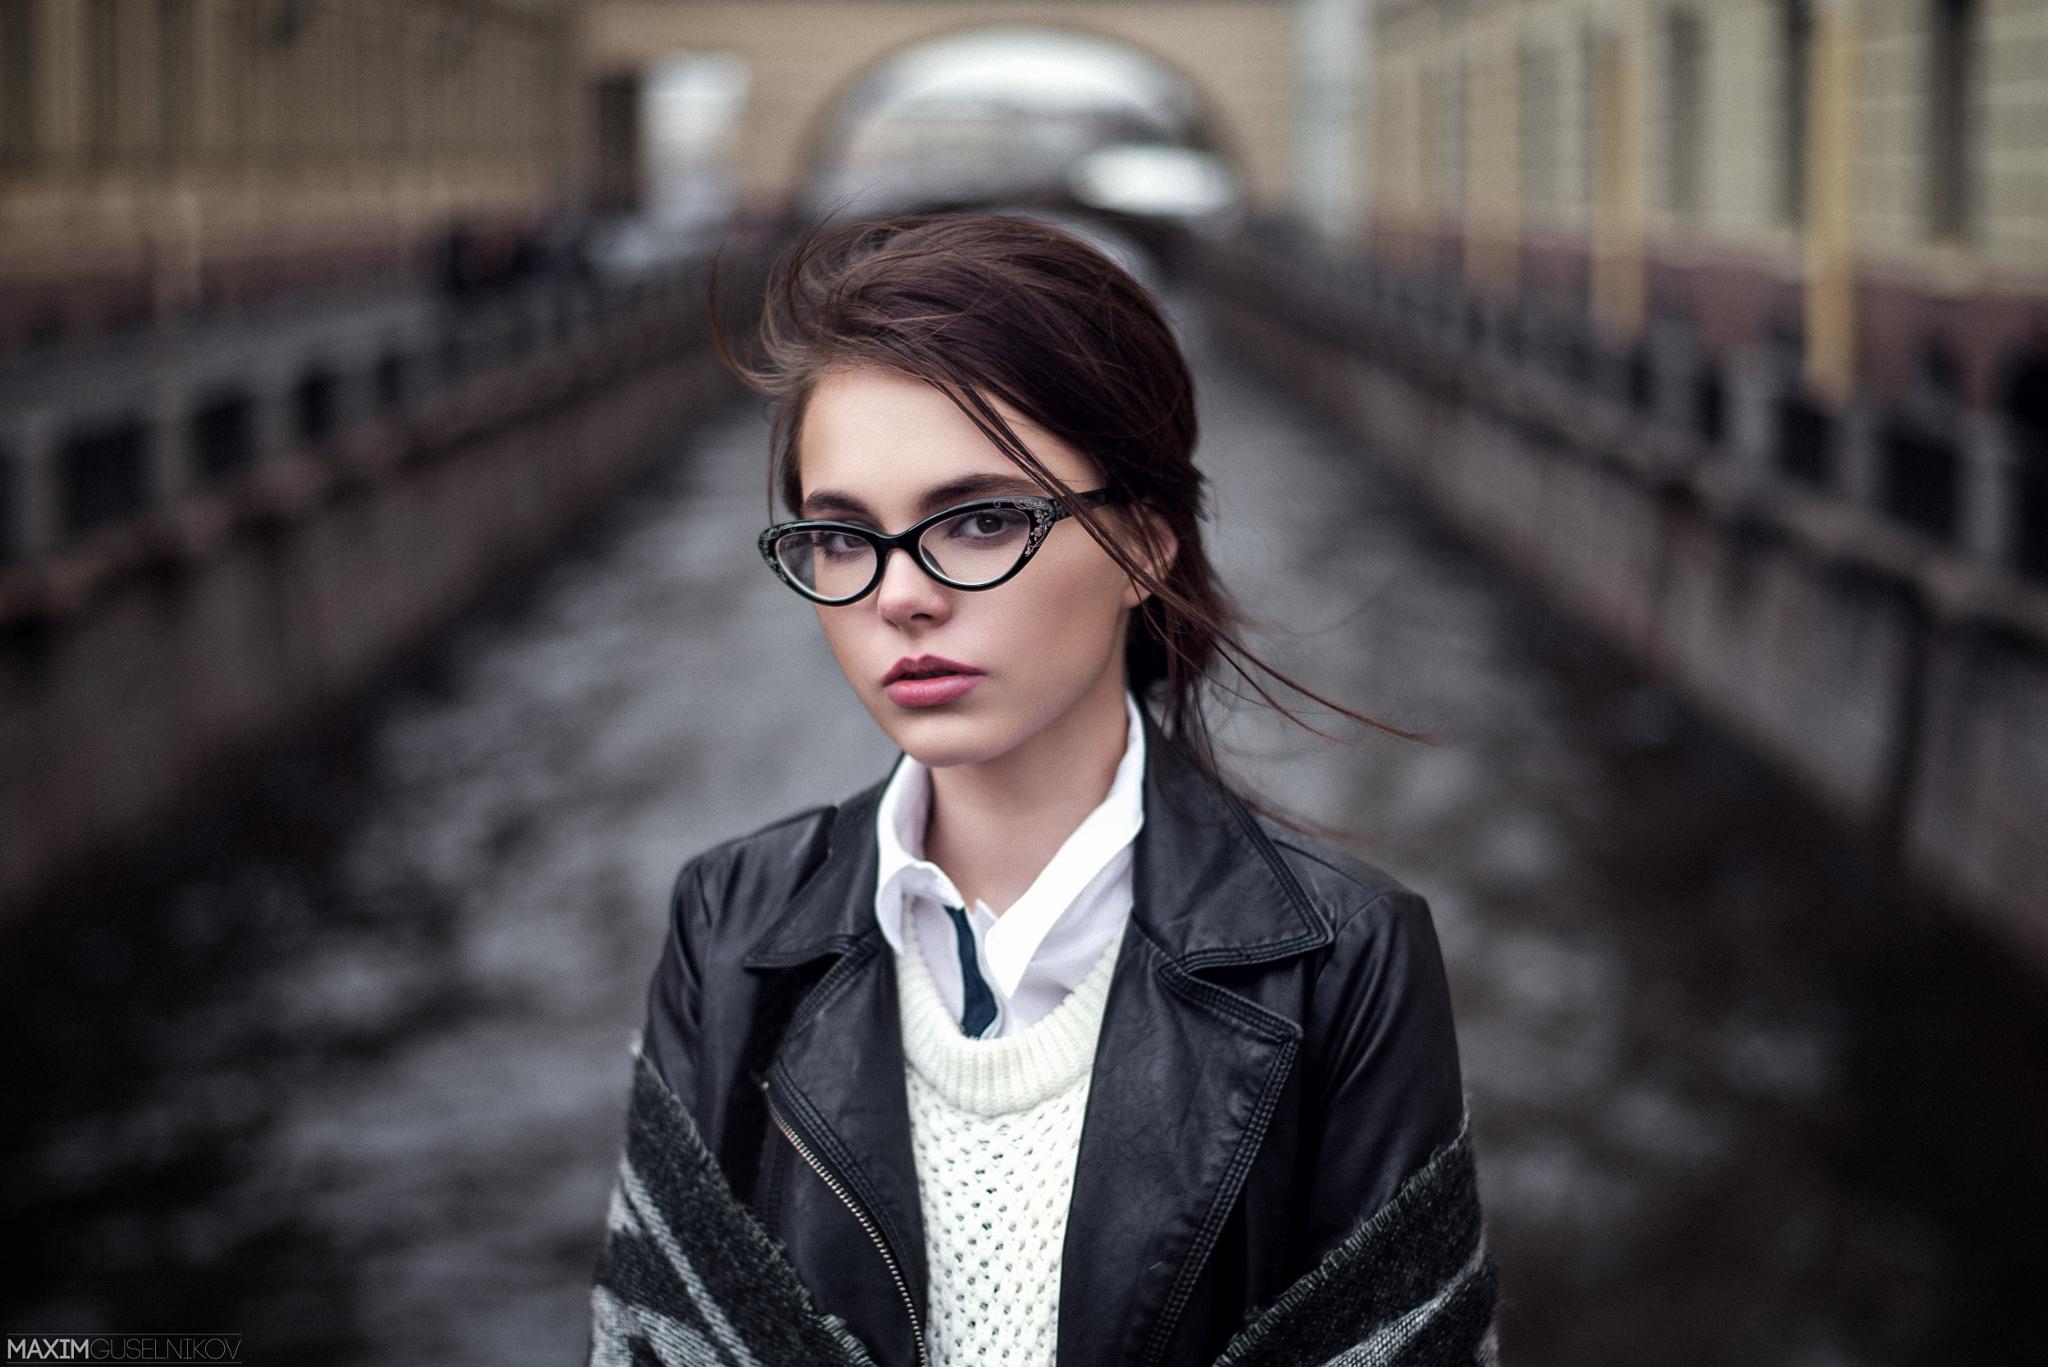 High Resolution Wallpaper   Oktyabrina Maximova 2048x1367 px